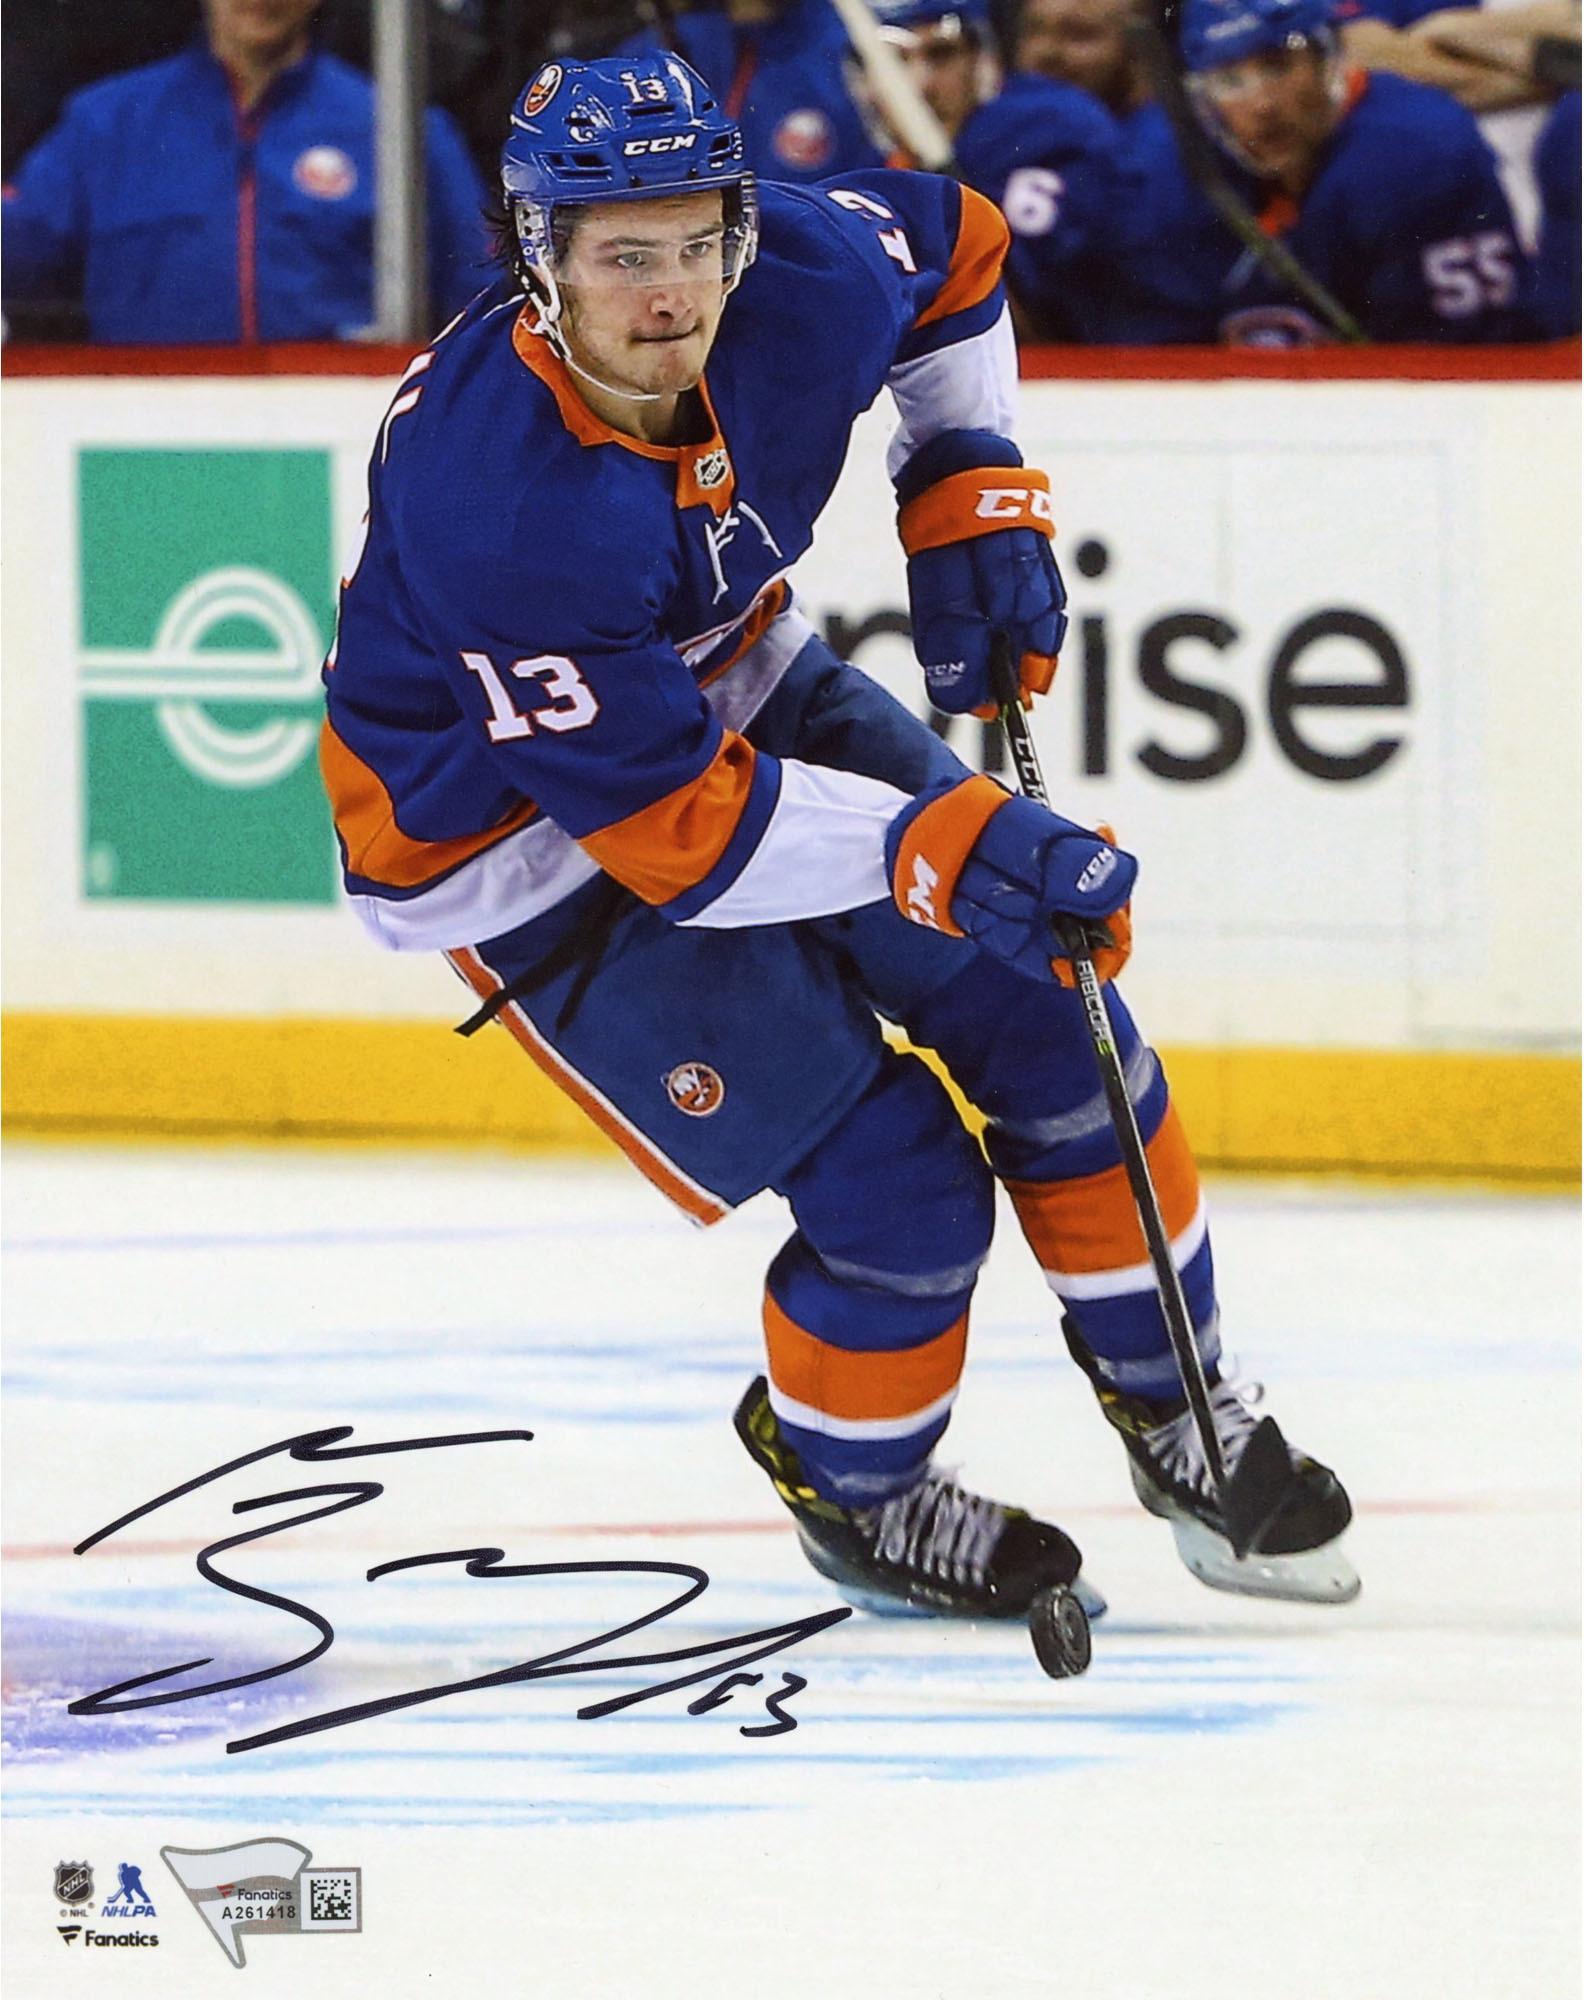 "Mathew Barzal New York Islanders Autographed 8"" x 10"" Blue Jersey Skating Photograph Fanatics Authentic... by Fanatics Authentic"